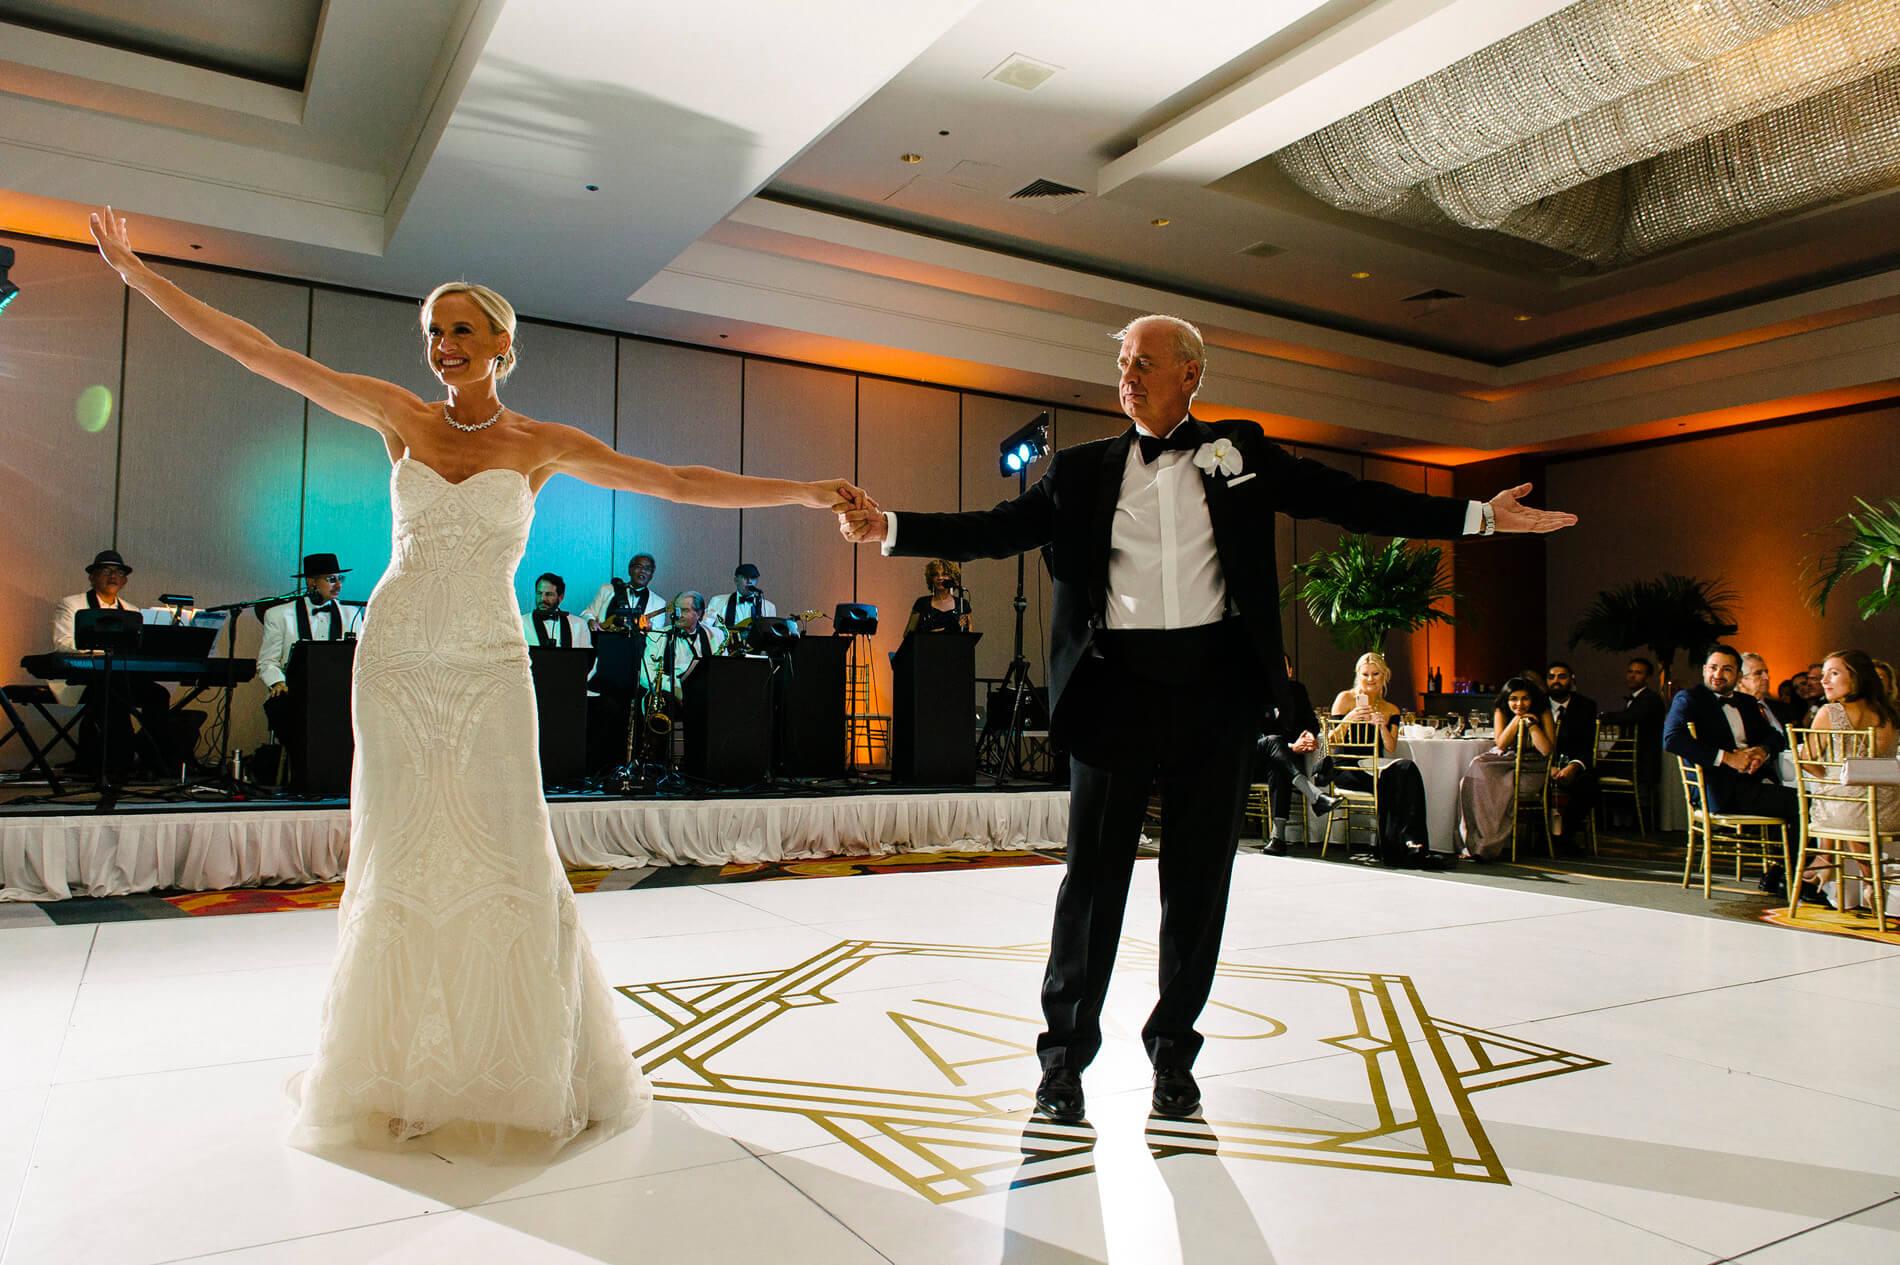 best father daughter dance moment hilton la jolla torrey pines wedding